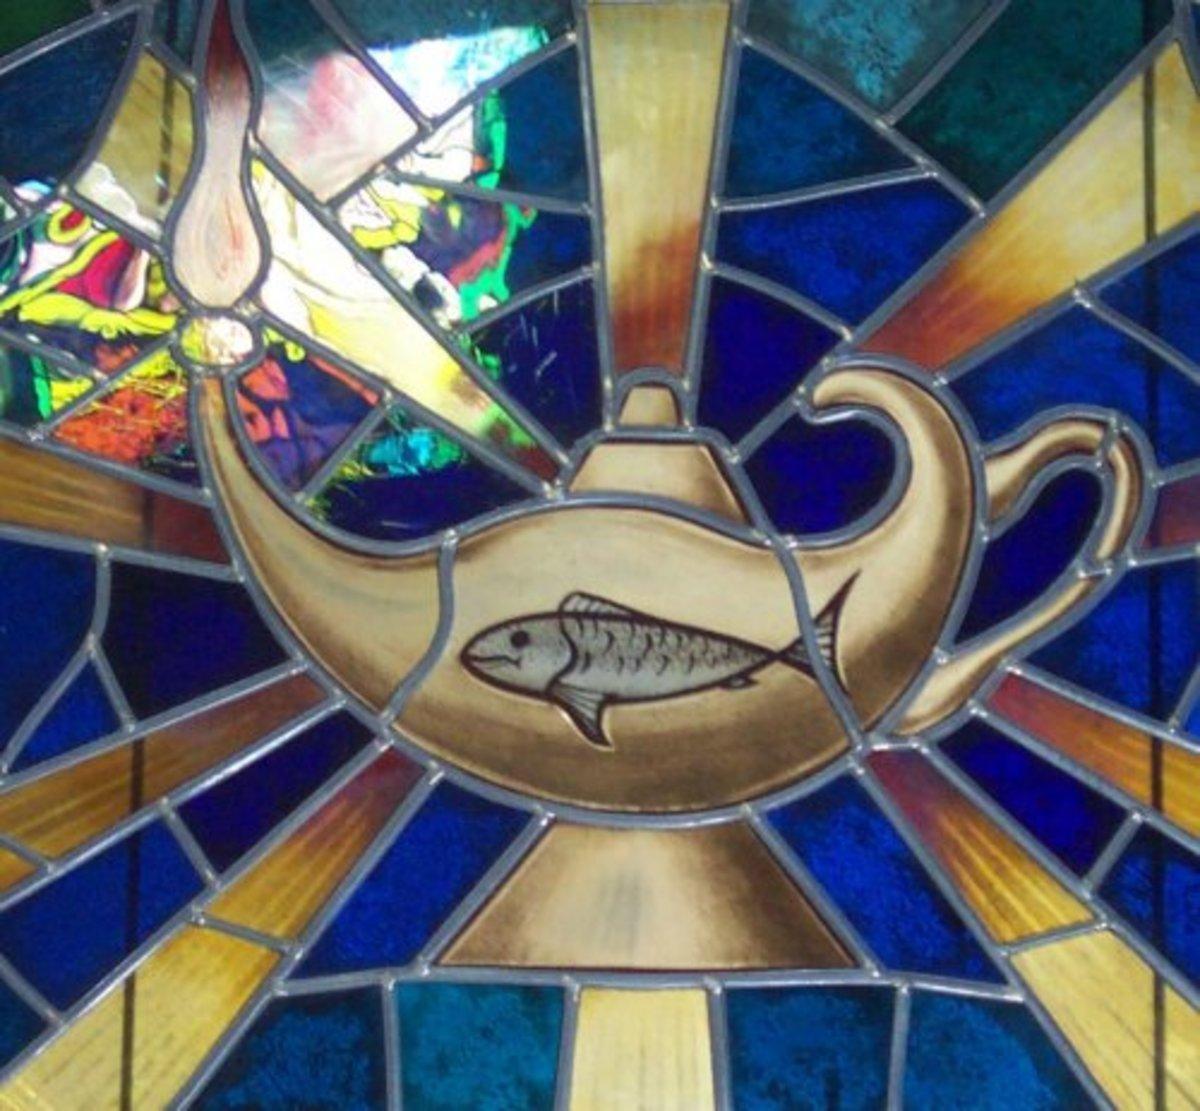 Fish, lamp and sun symbol in a church in Vilaflor